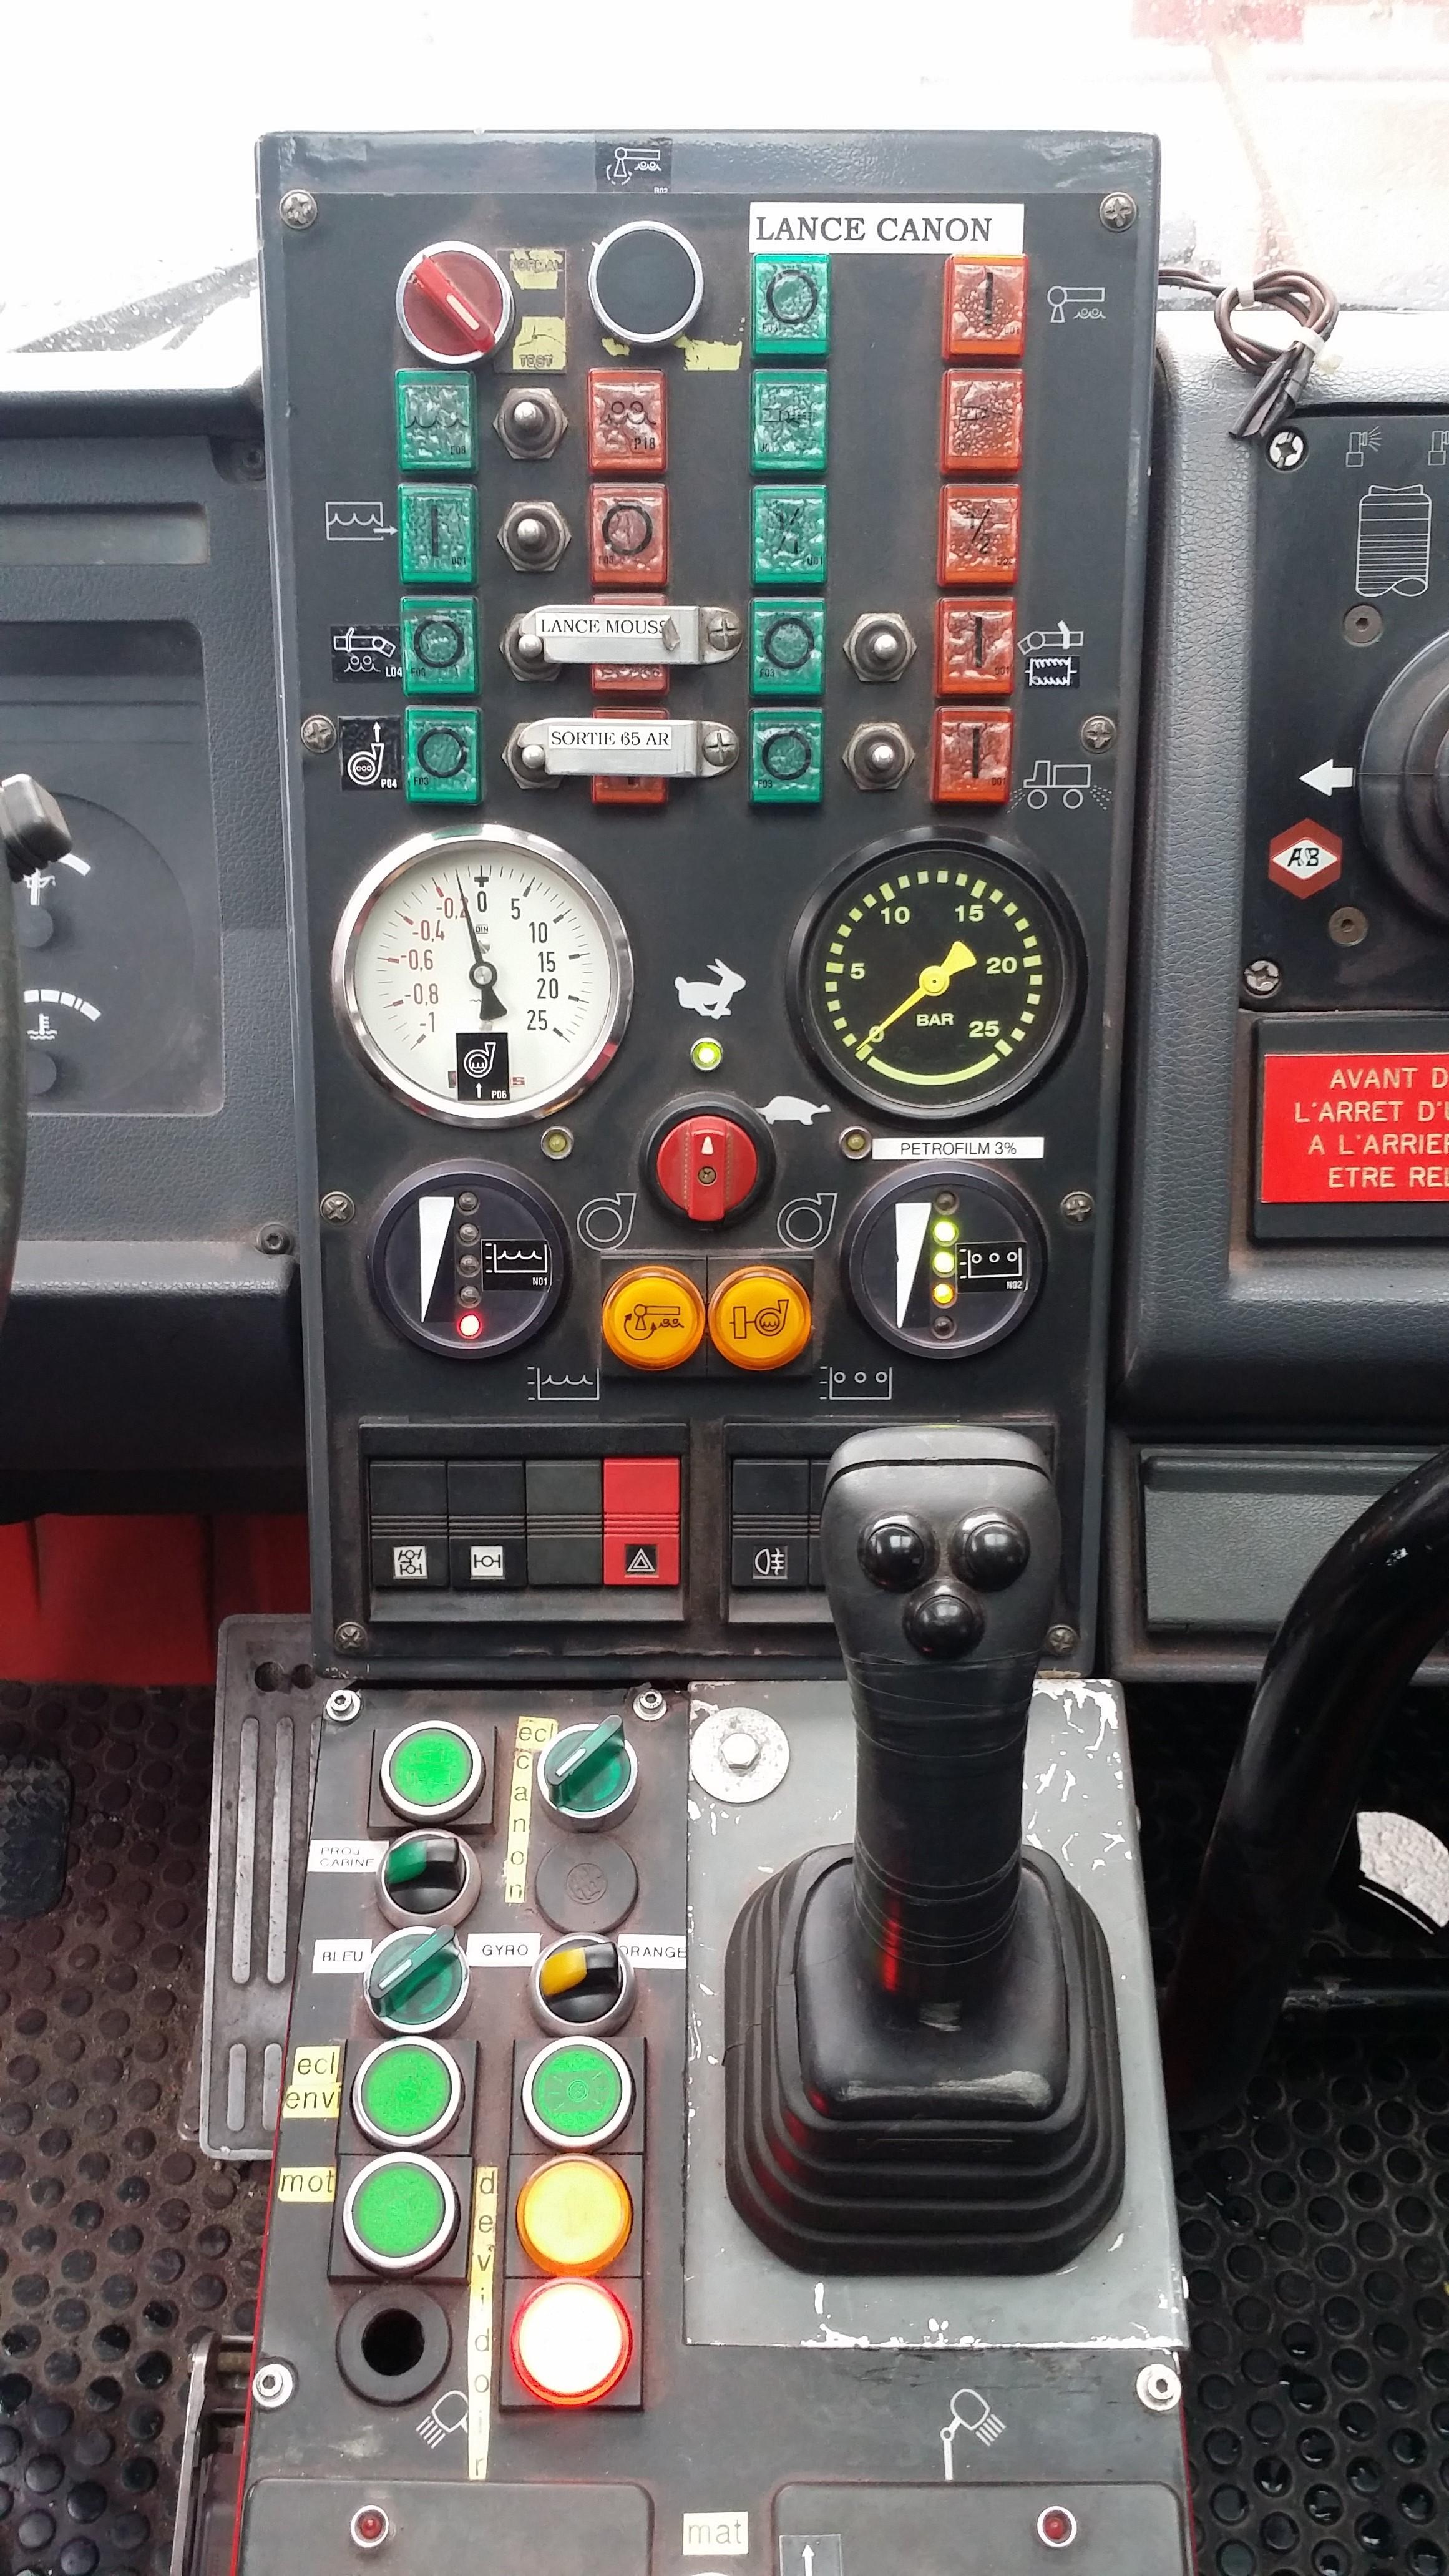 Aircraft Rescue Amp Firefighting V 233 Hicules De Secours Et